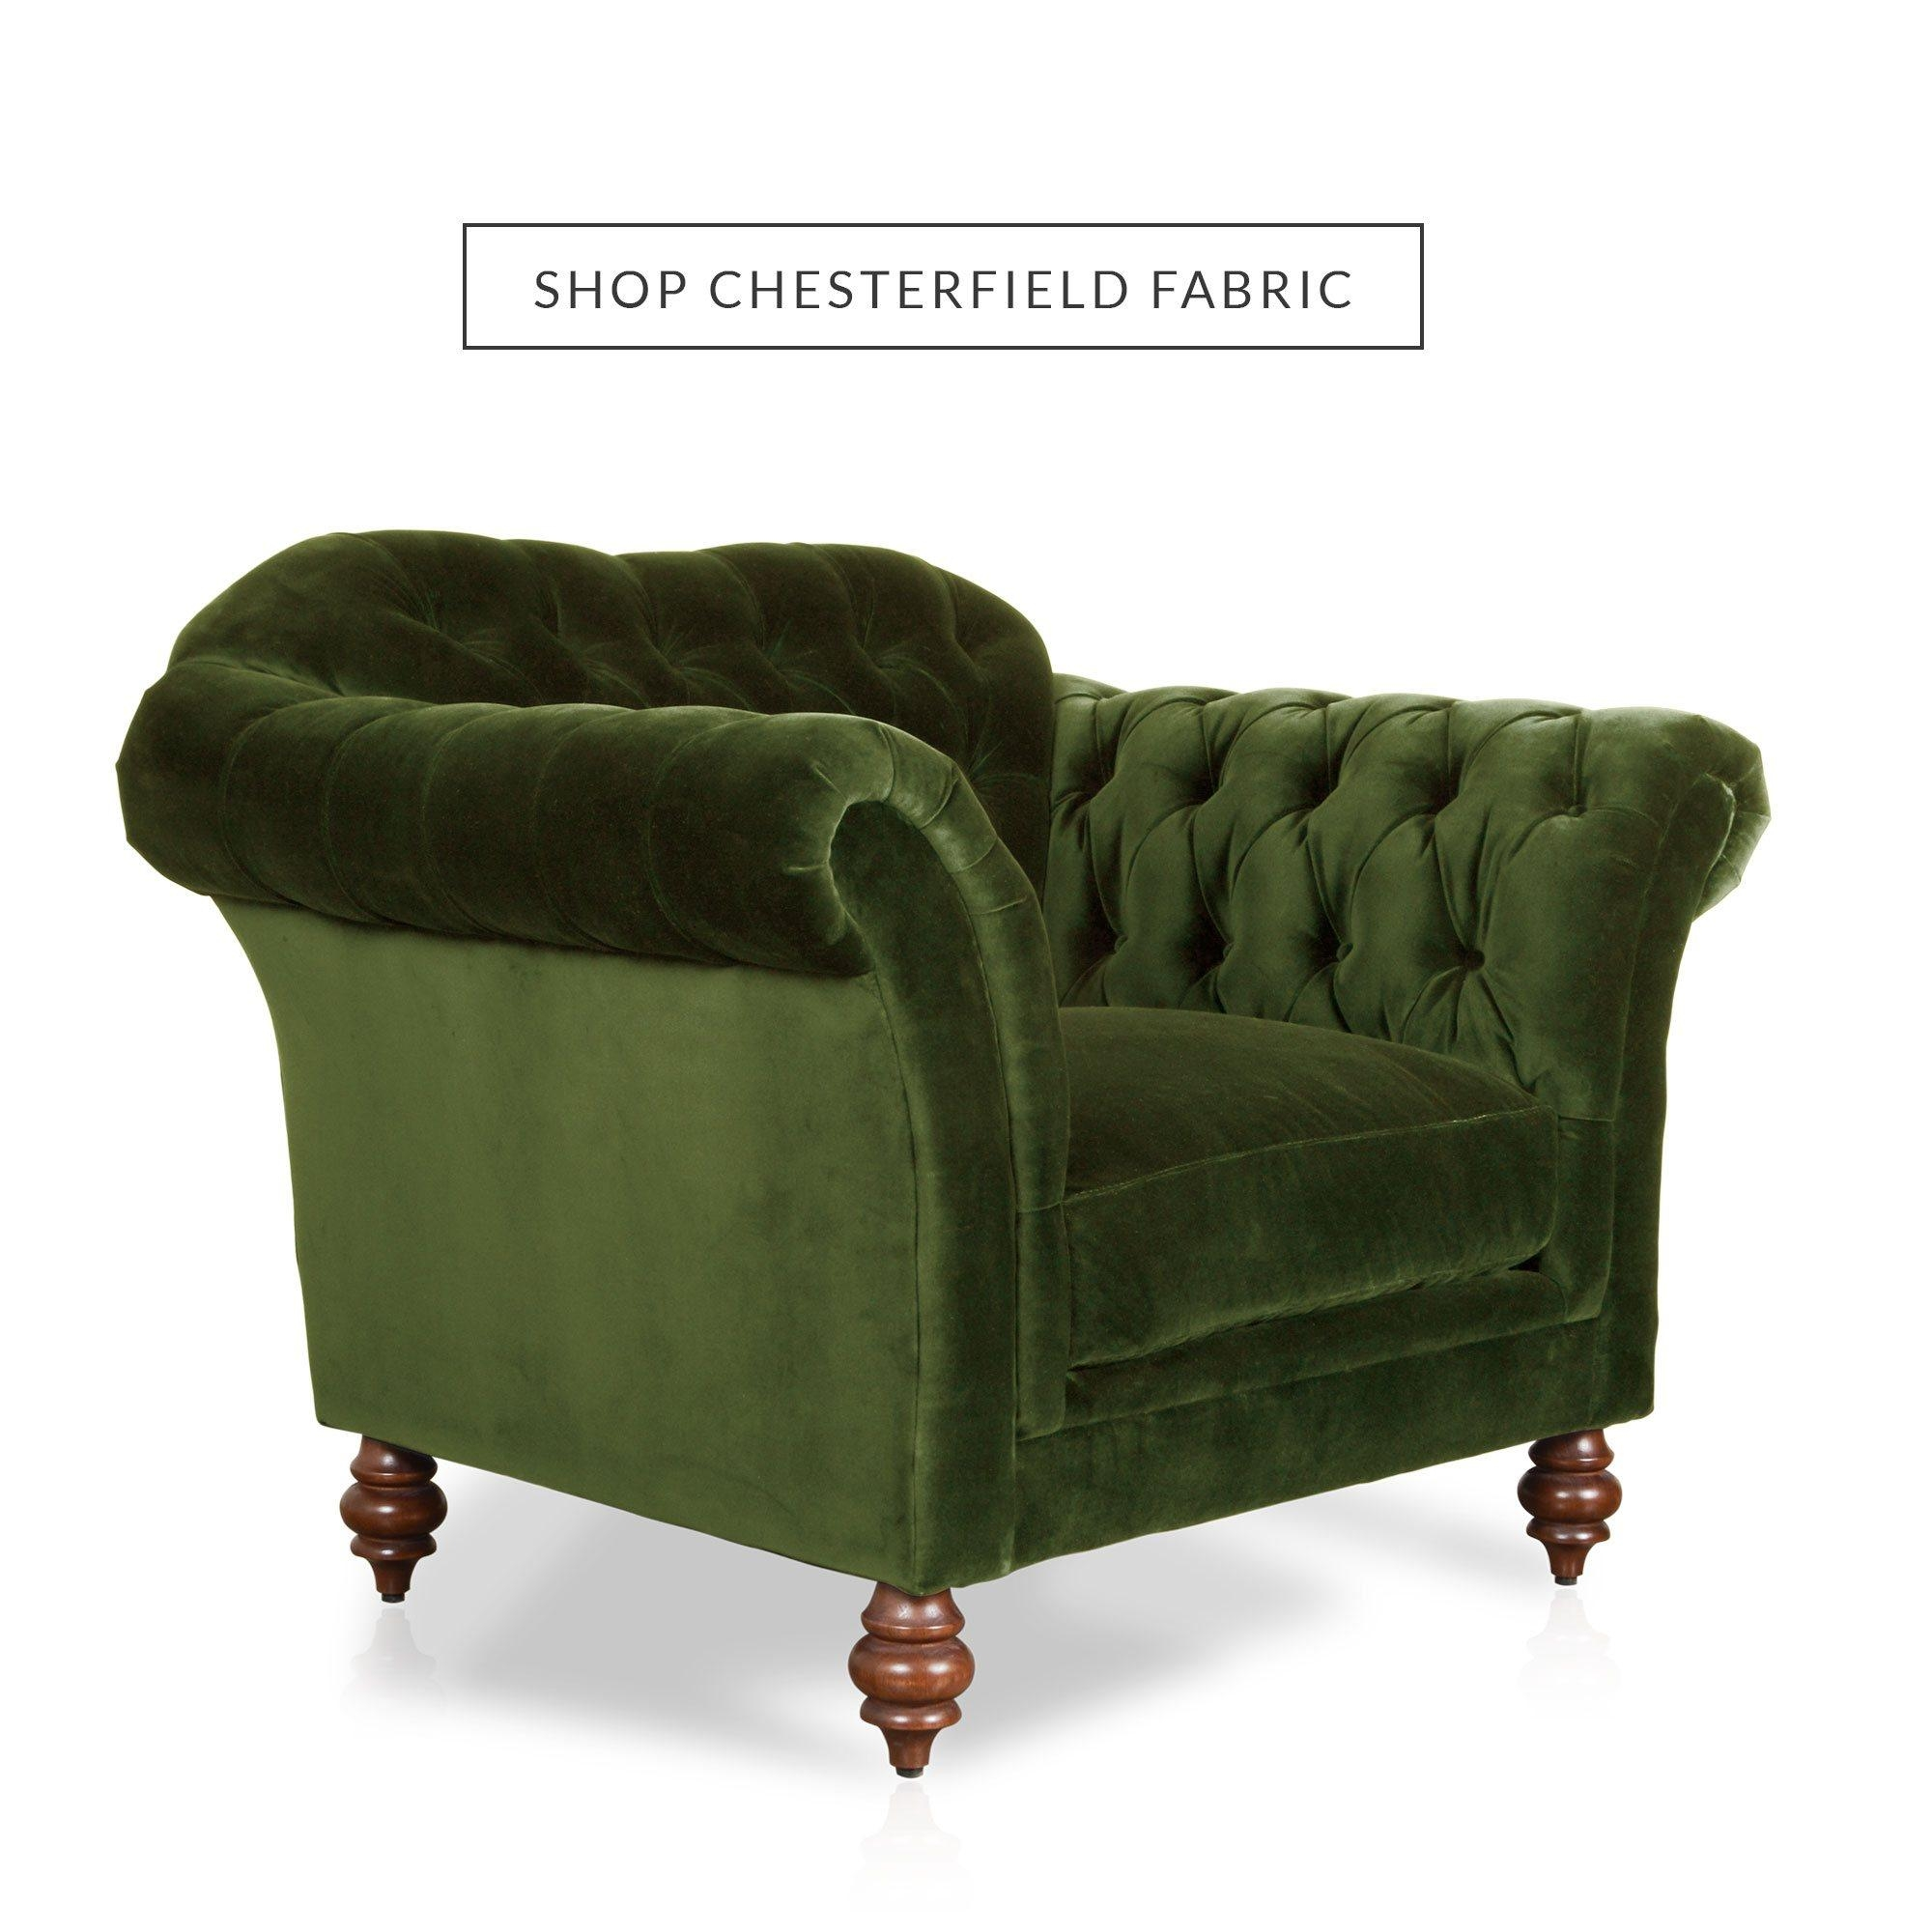 20 Photos Chesterfield Sofas and Chairs  Sofa Ideas